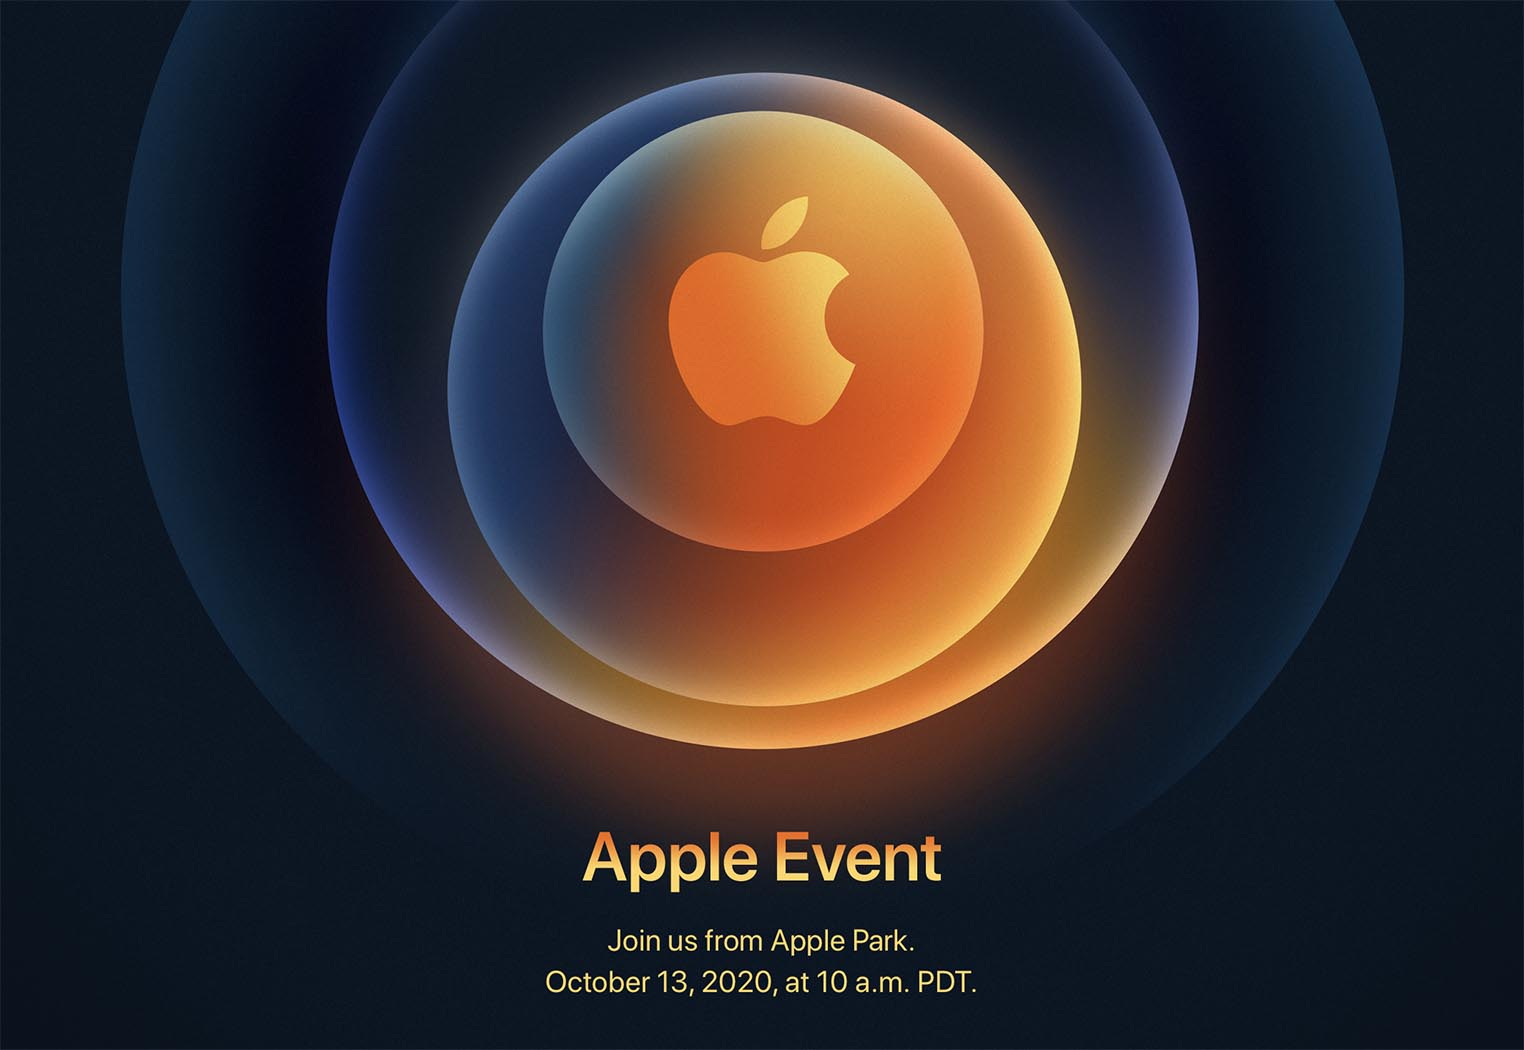 Apple Event iPhone 12